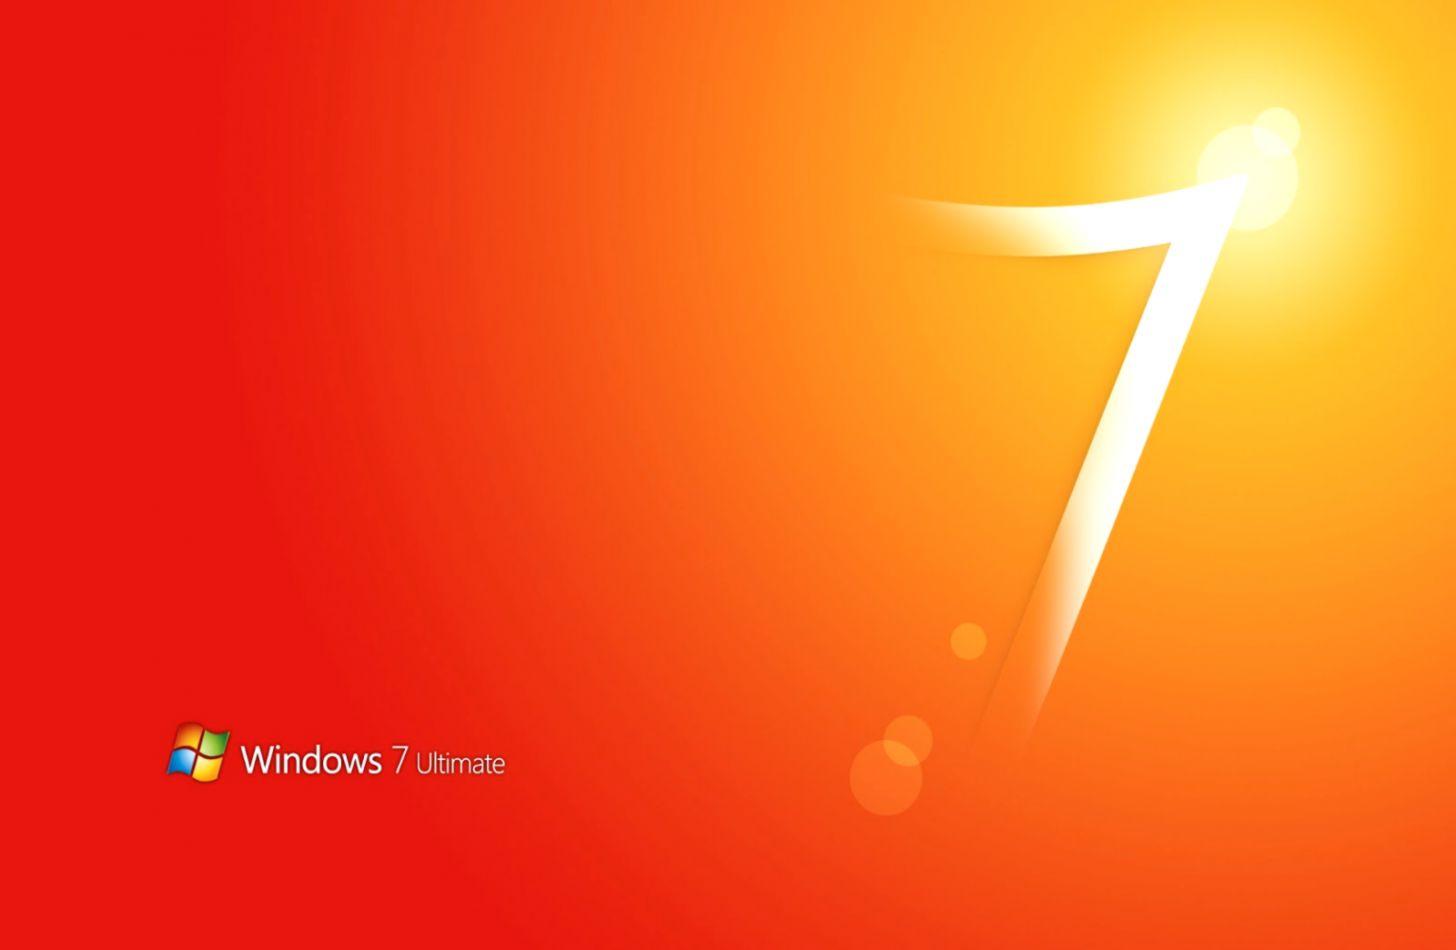 Windows 7 Orange Wallpaper Pack Wallpapers